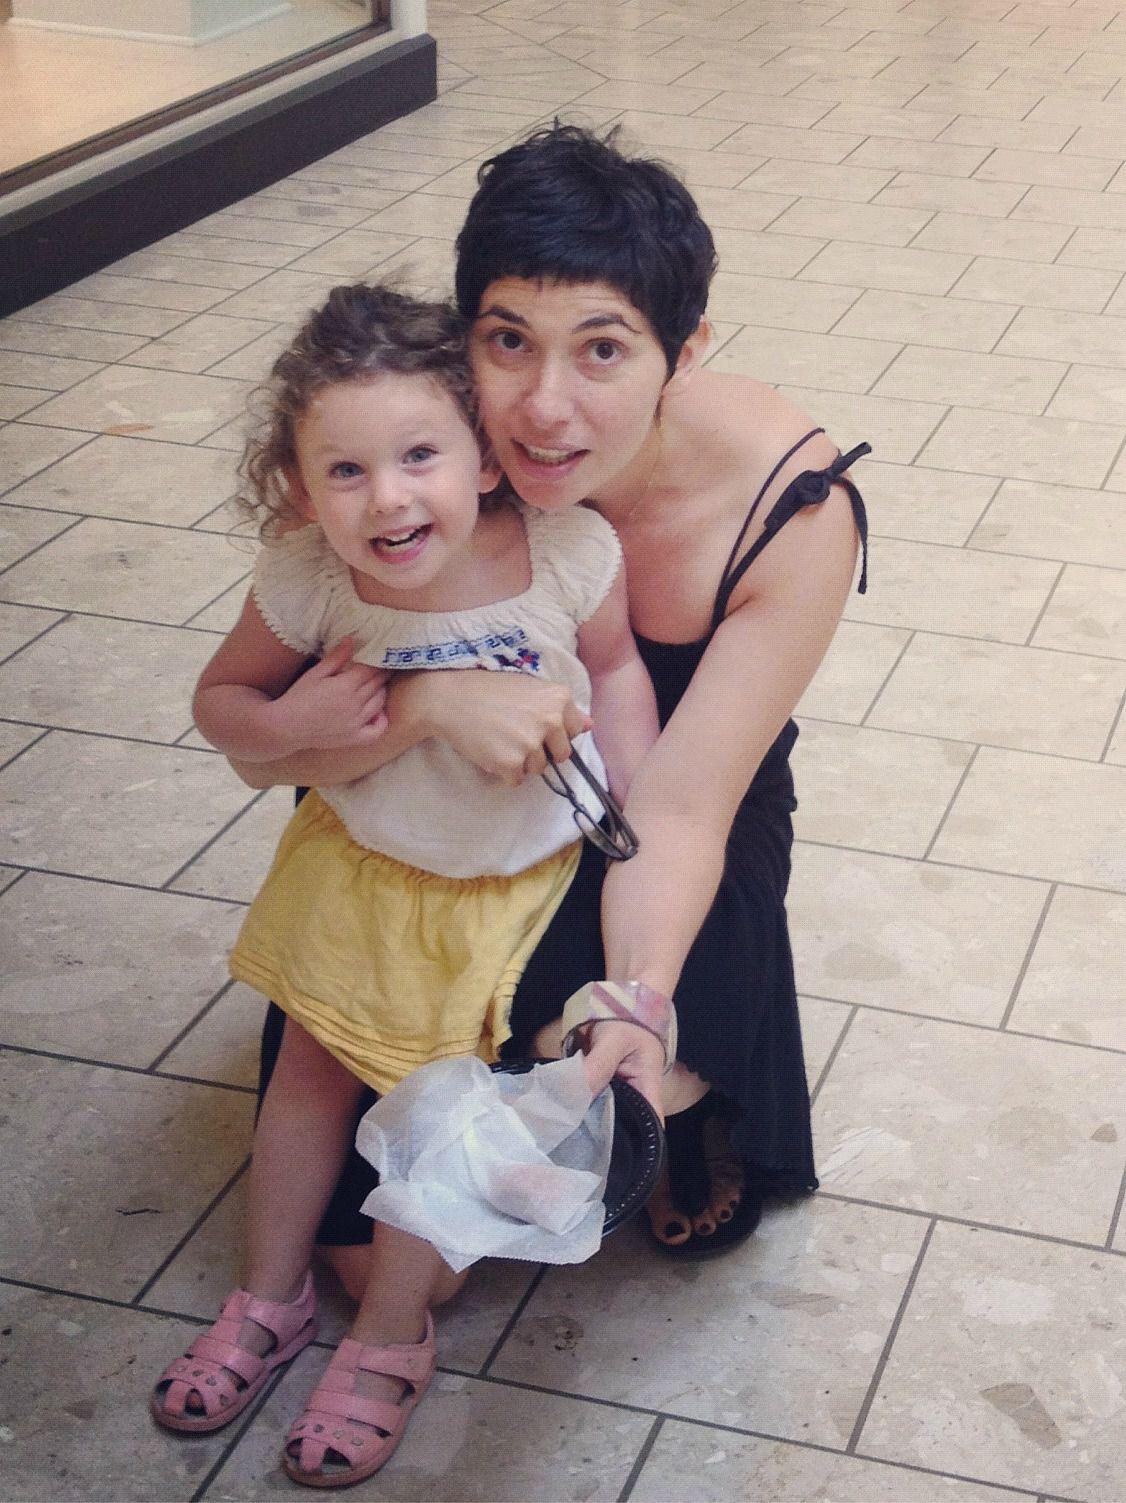 Deborah Kolben and her daughter, Mika